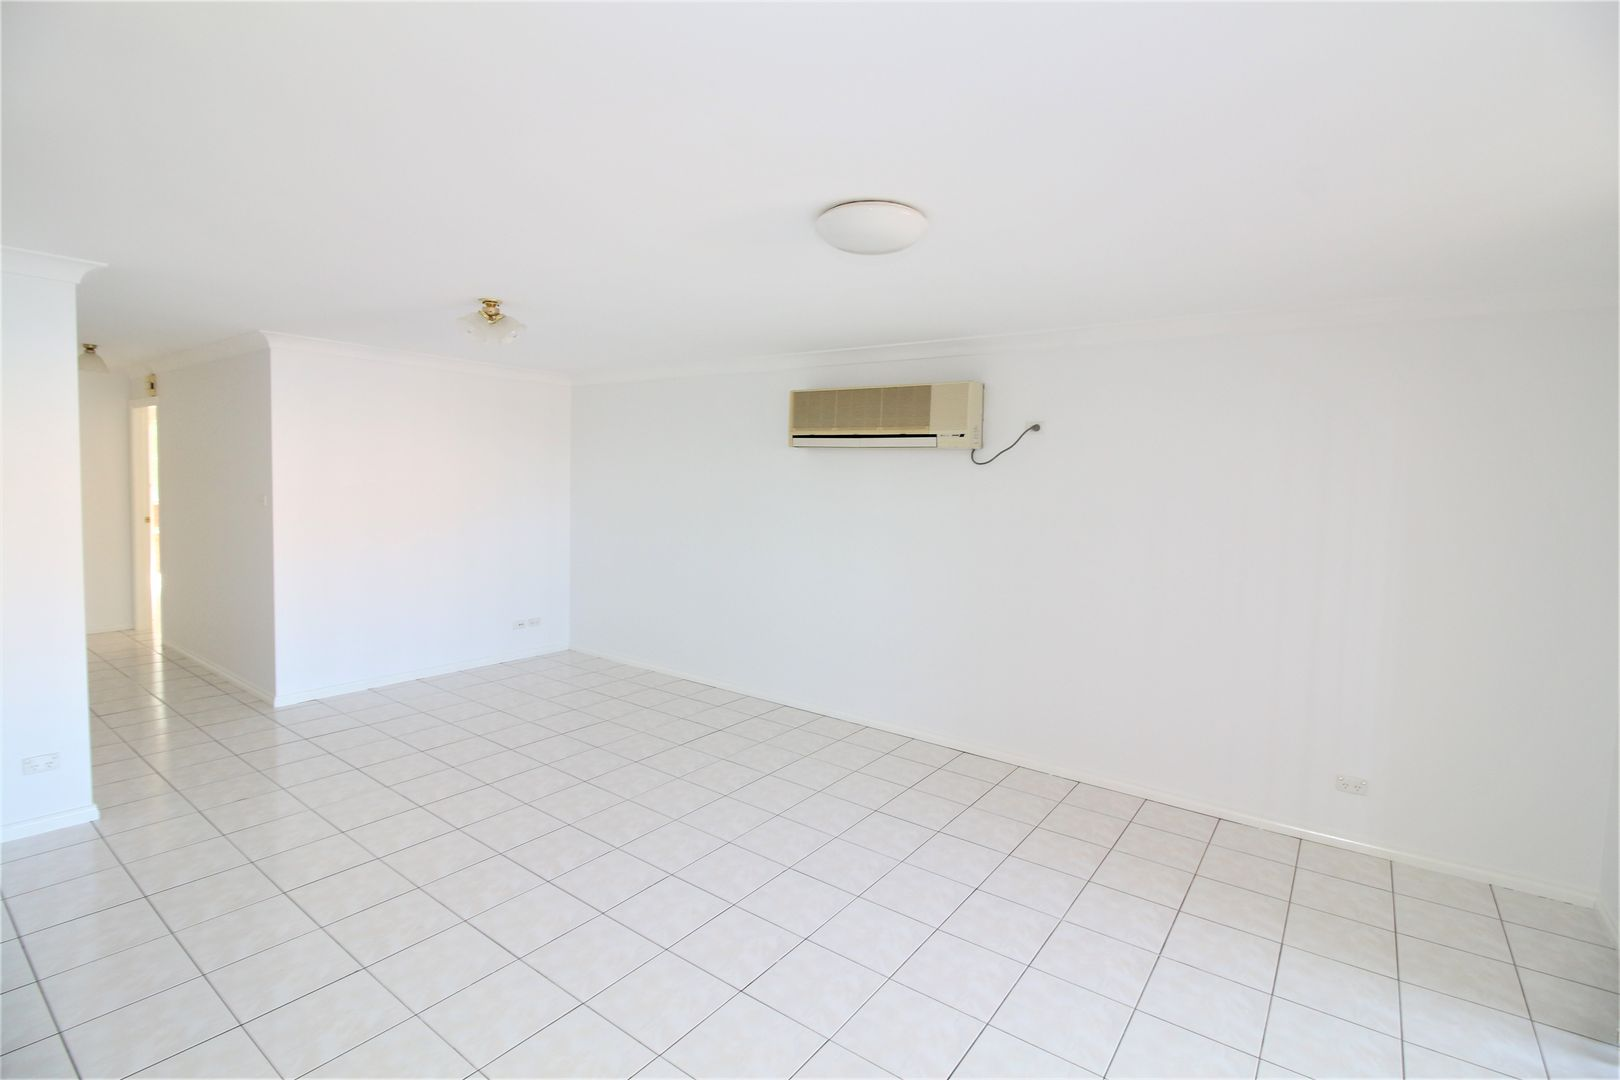 3/490 Banna Avenue, Griffith NSW 2680, Image 2